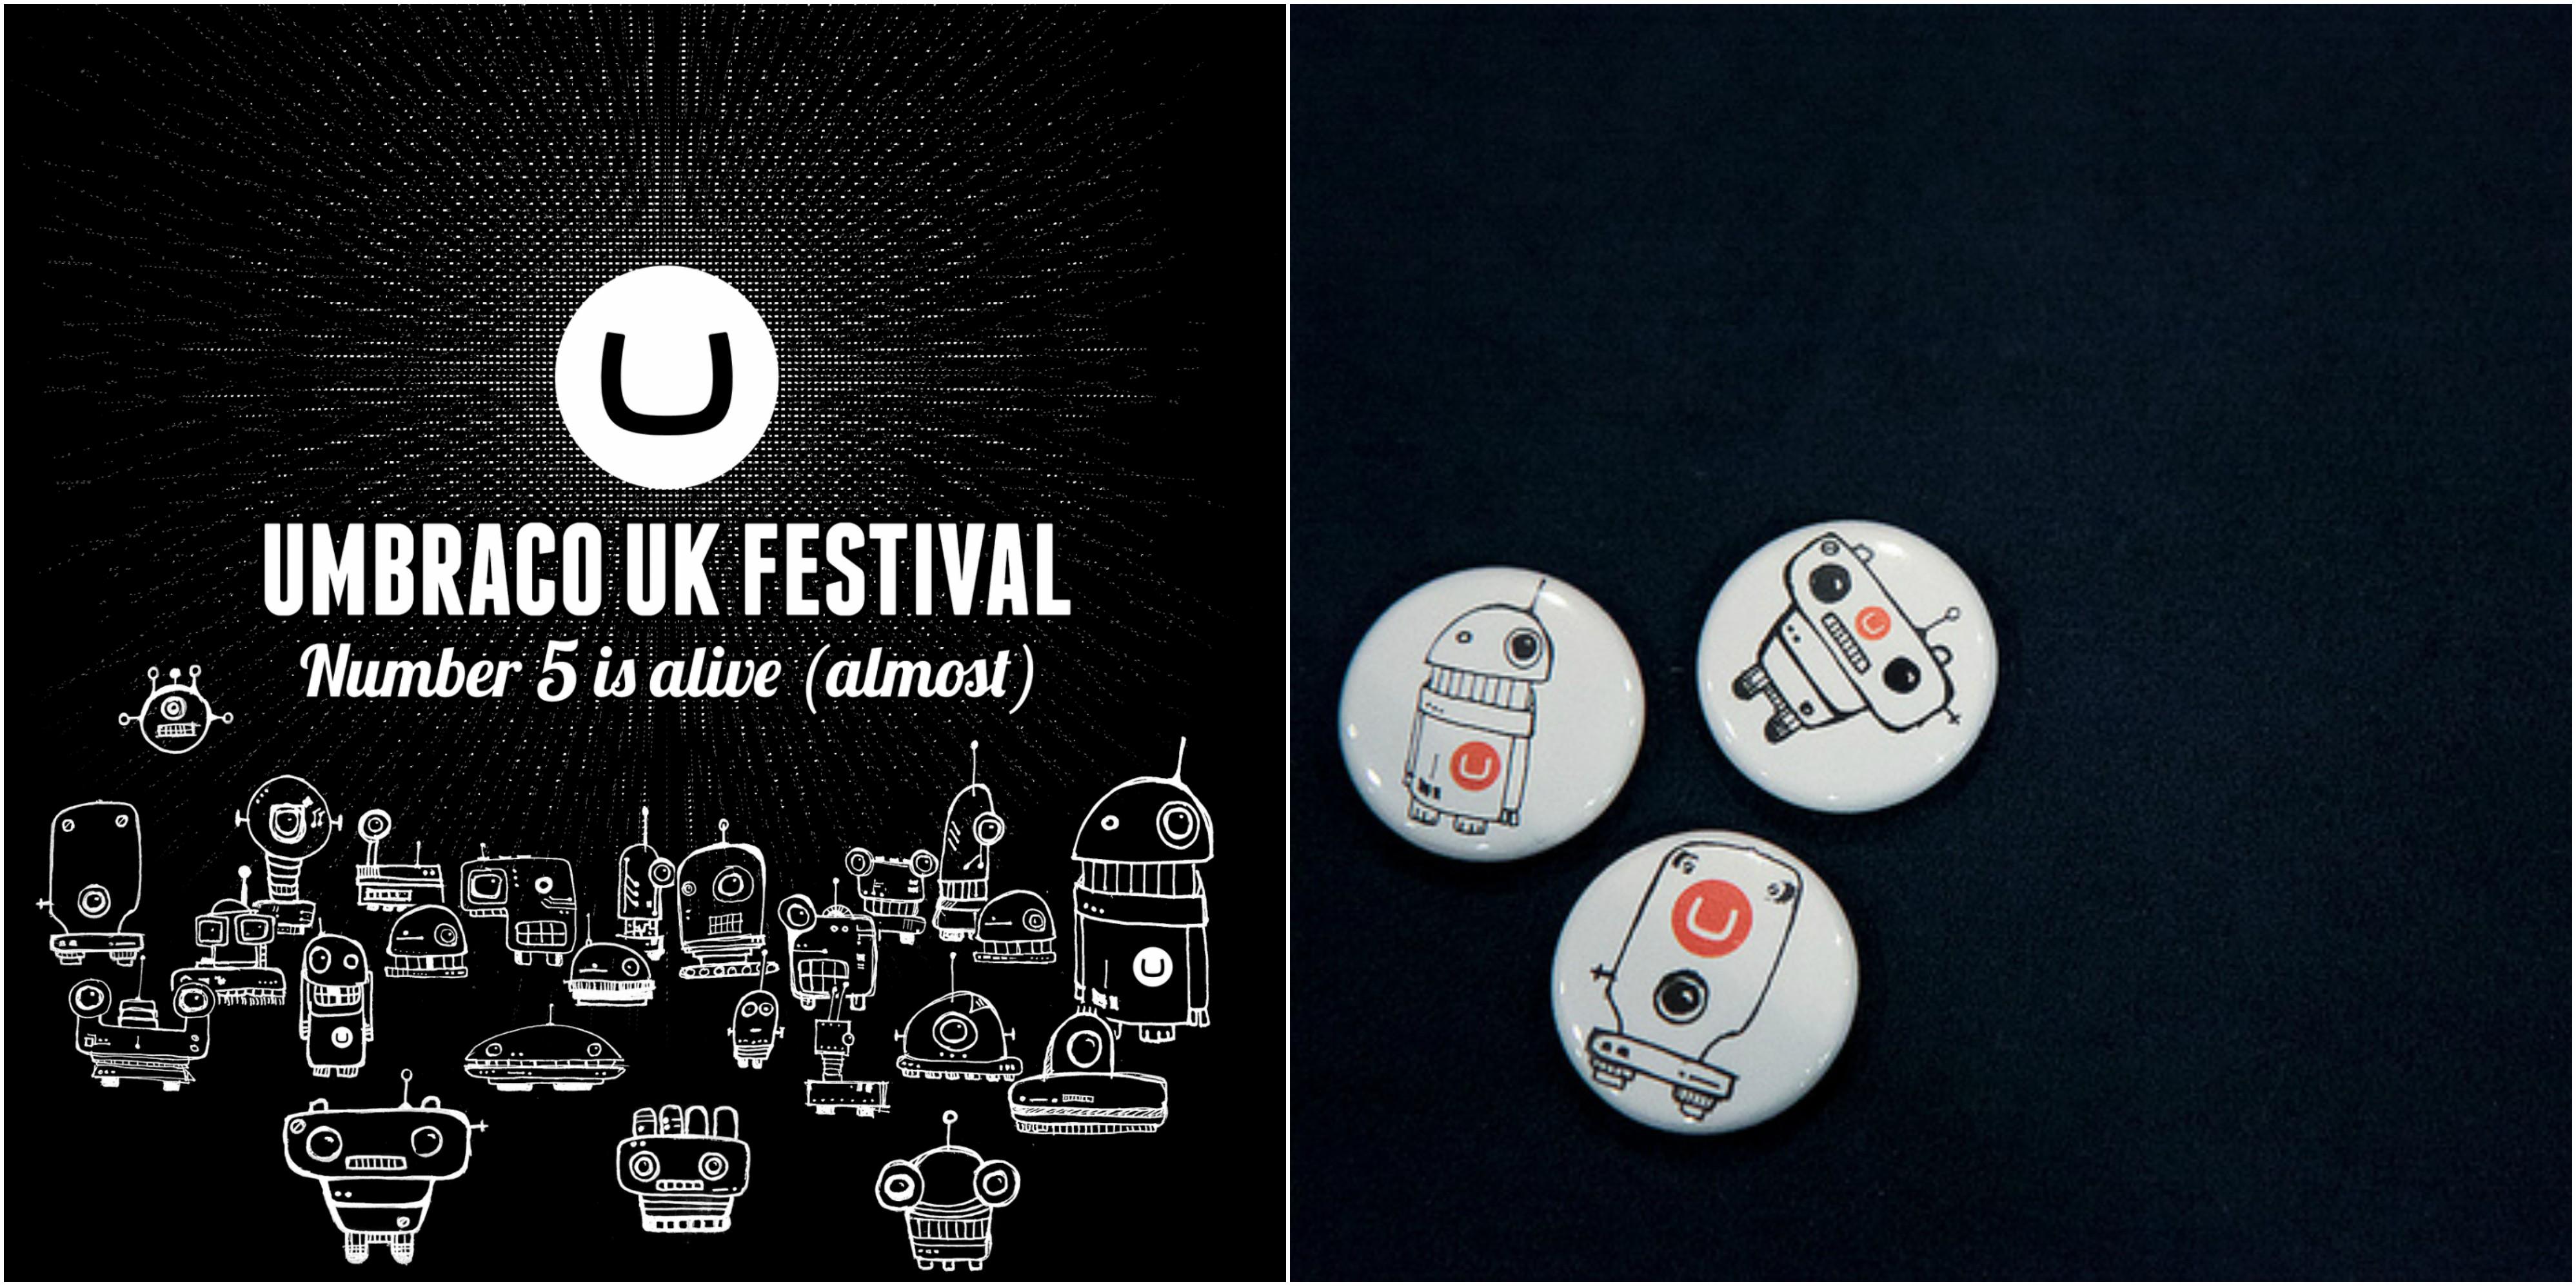 Umbraco UK Festival design 2011